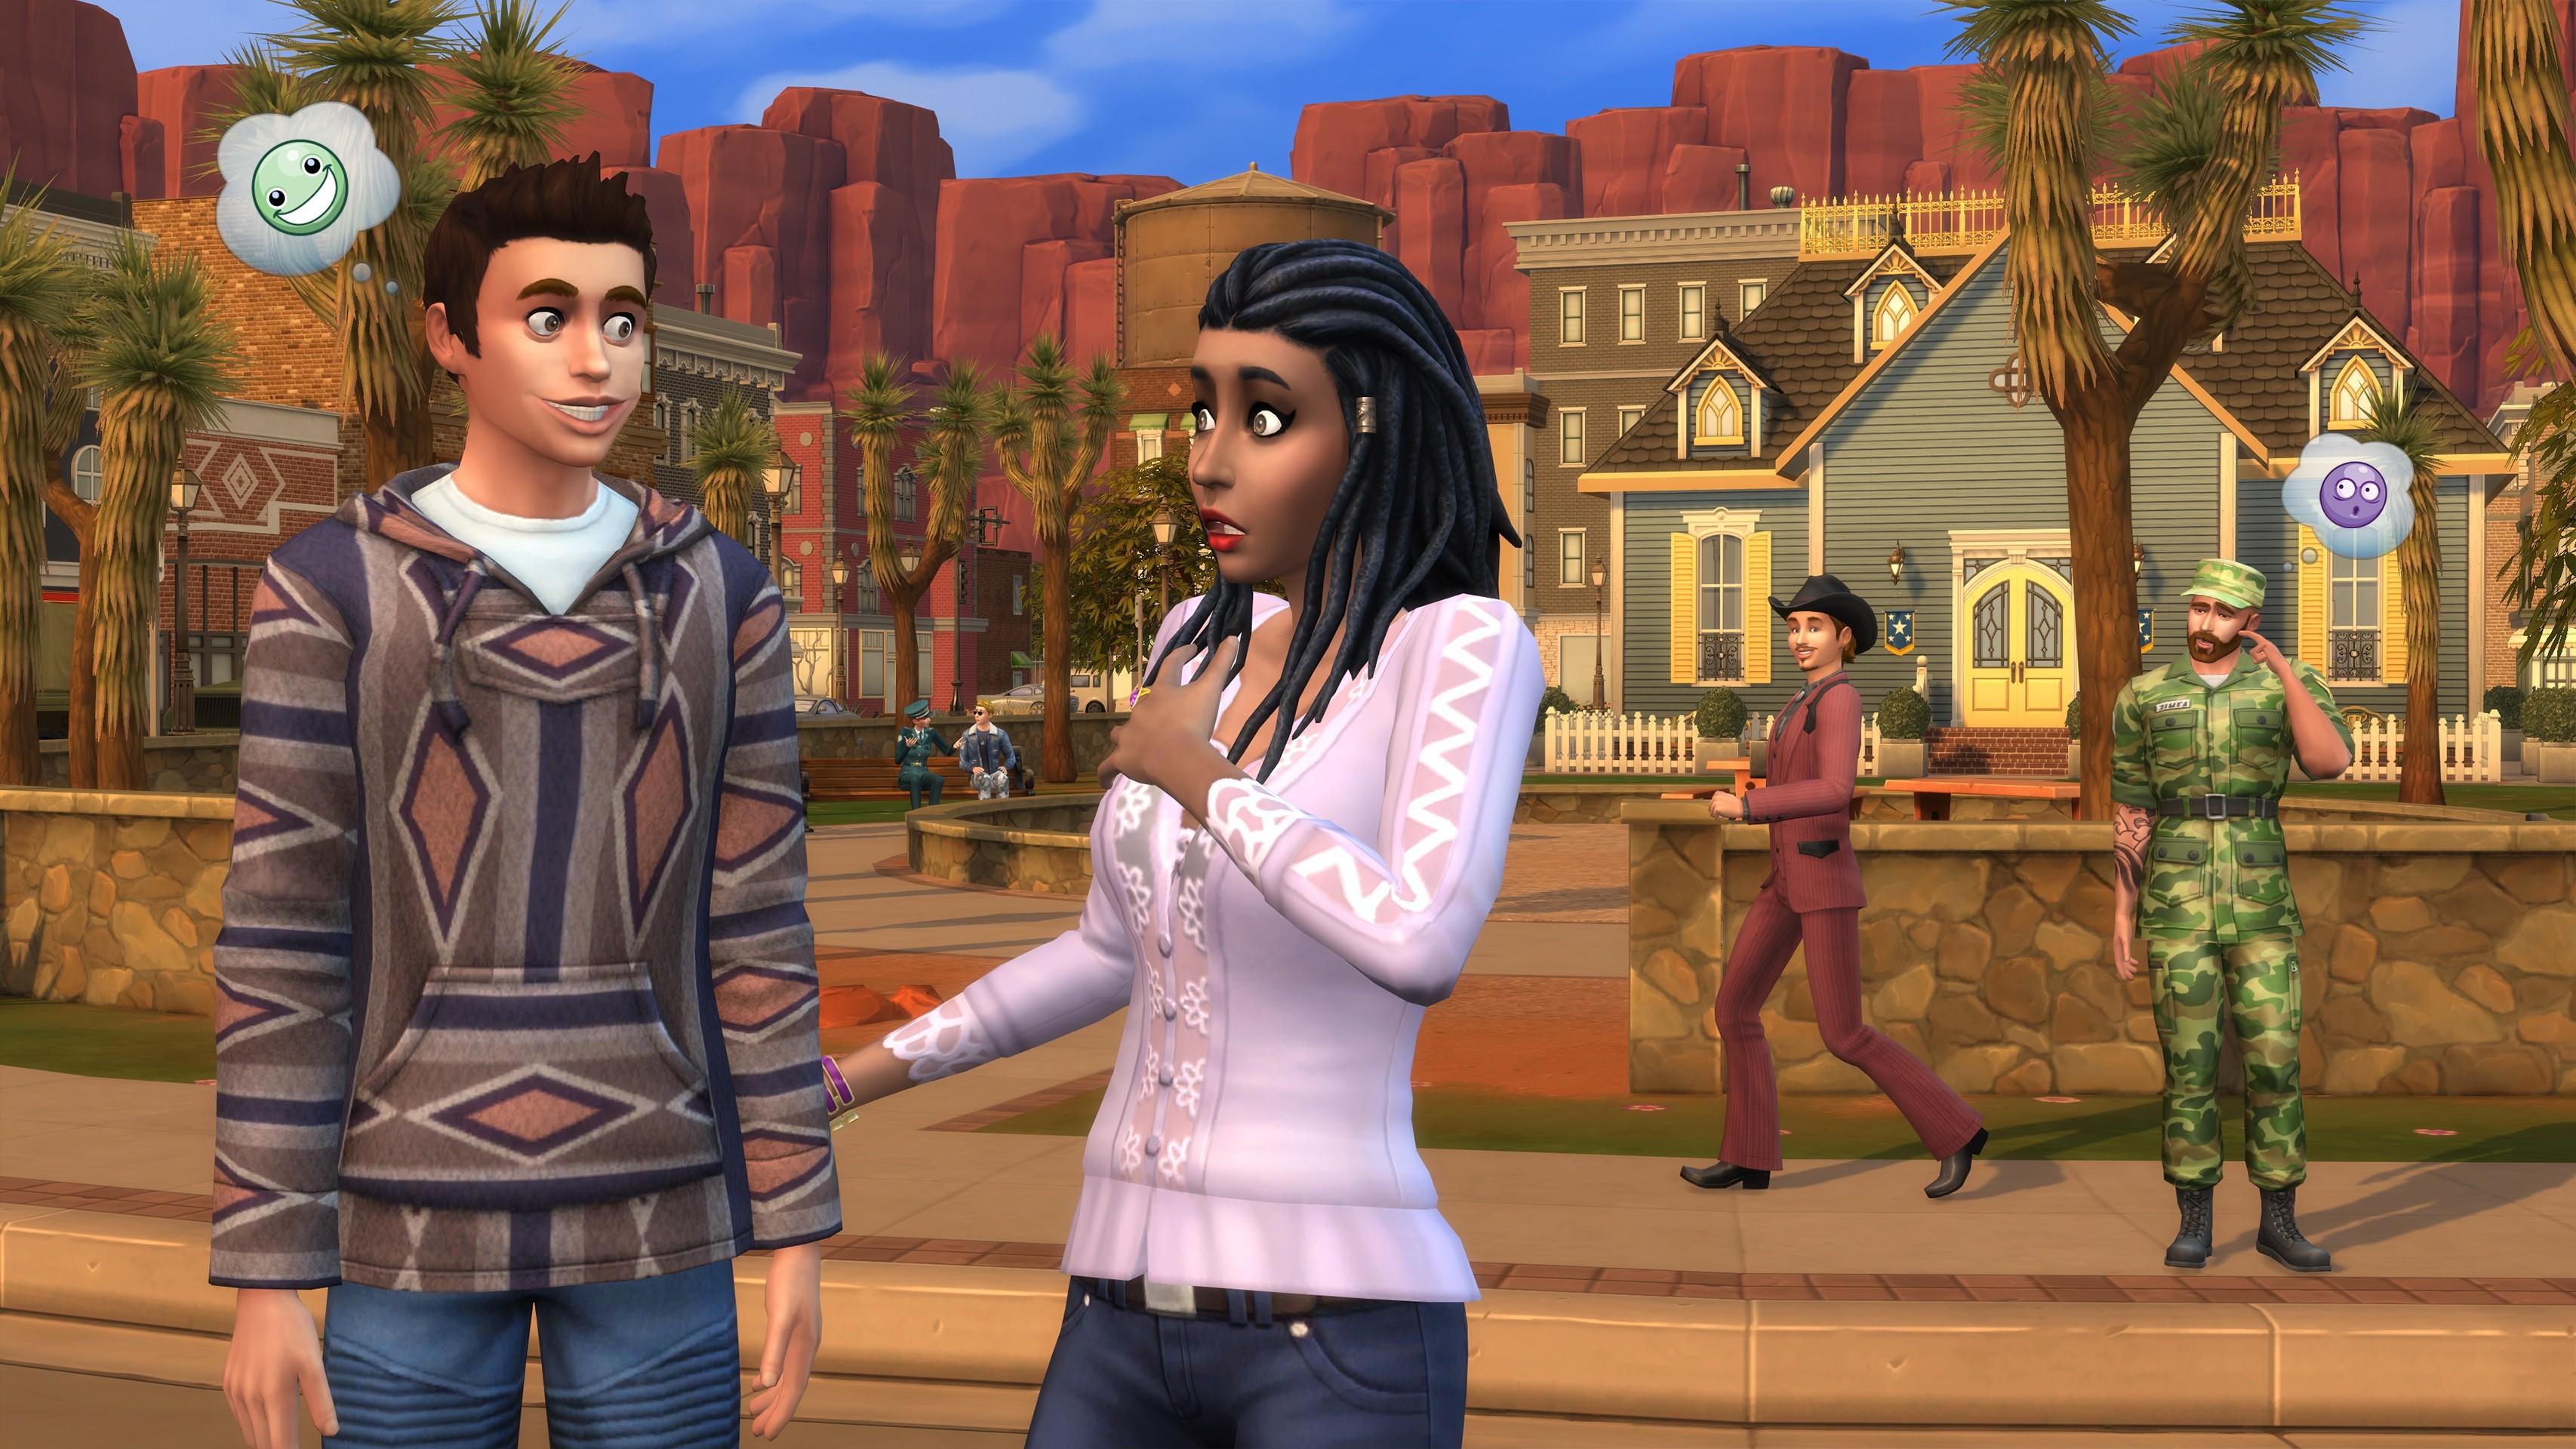 Sims 3 online dating äventyr